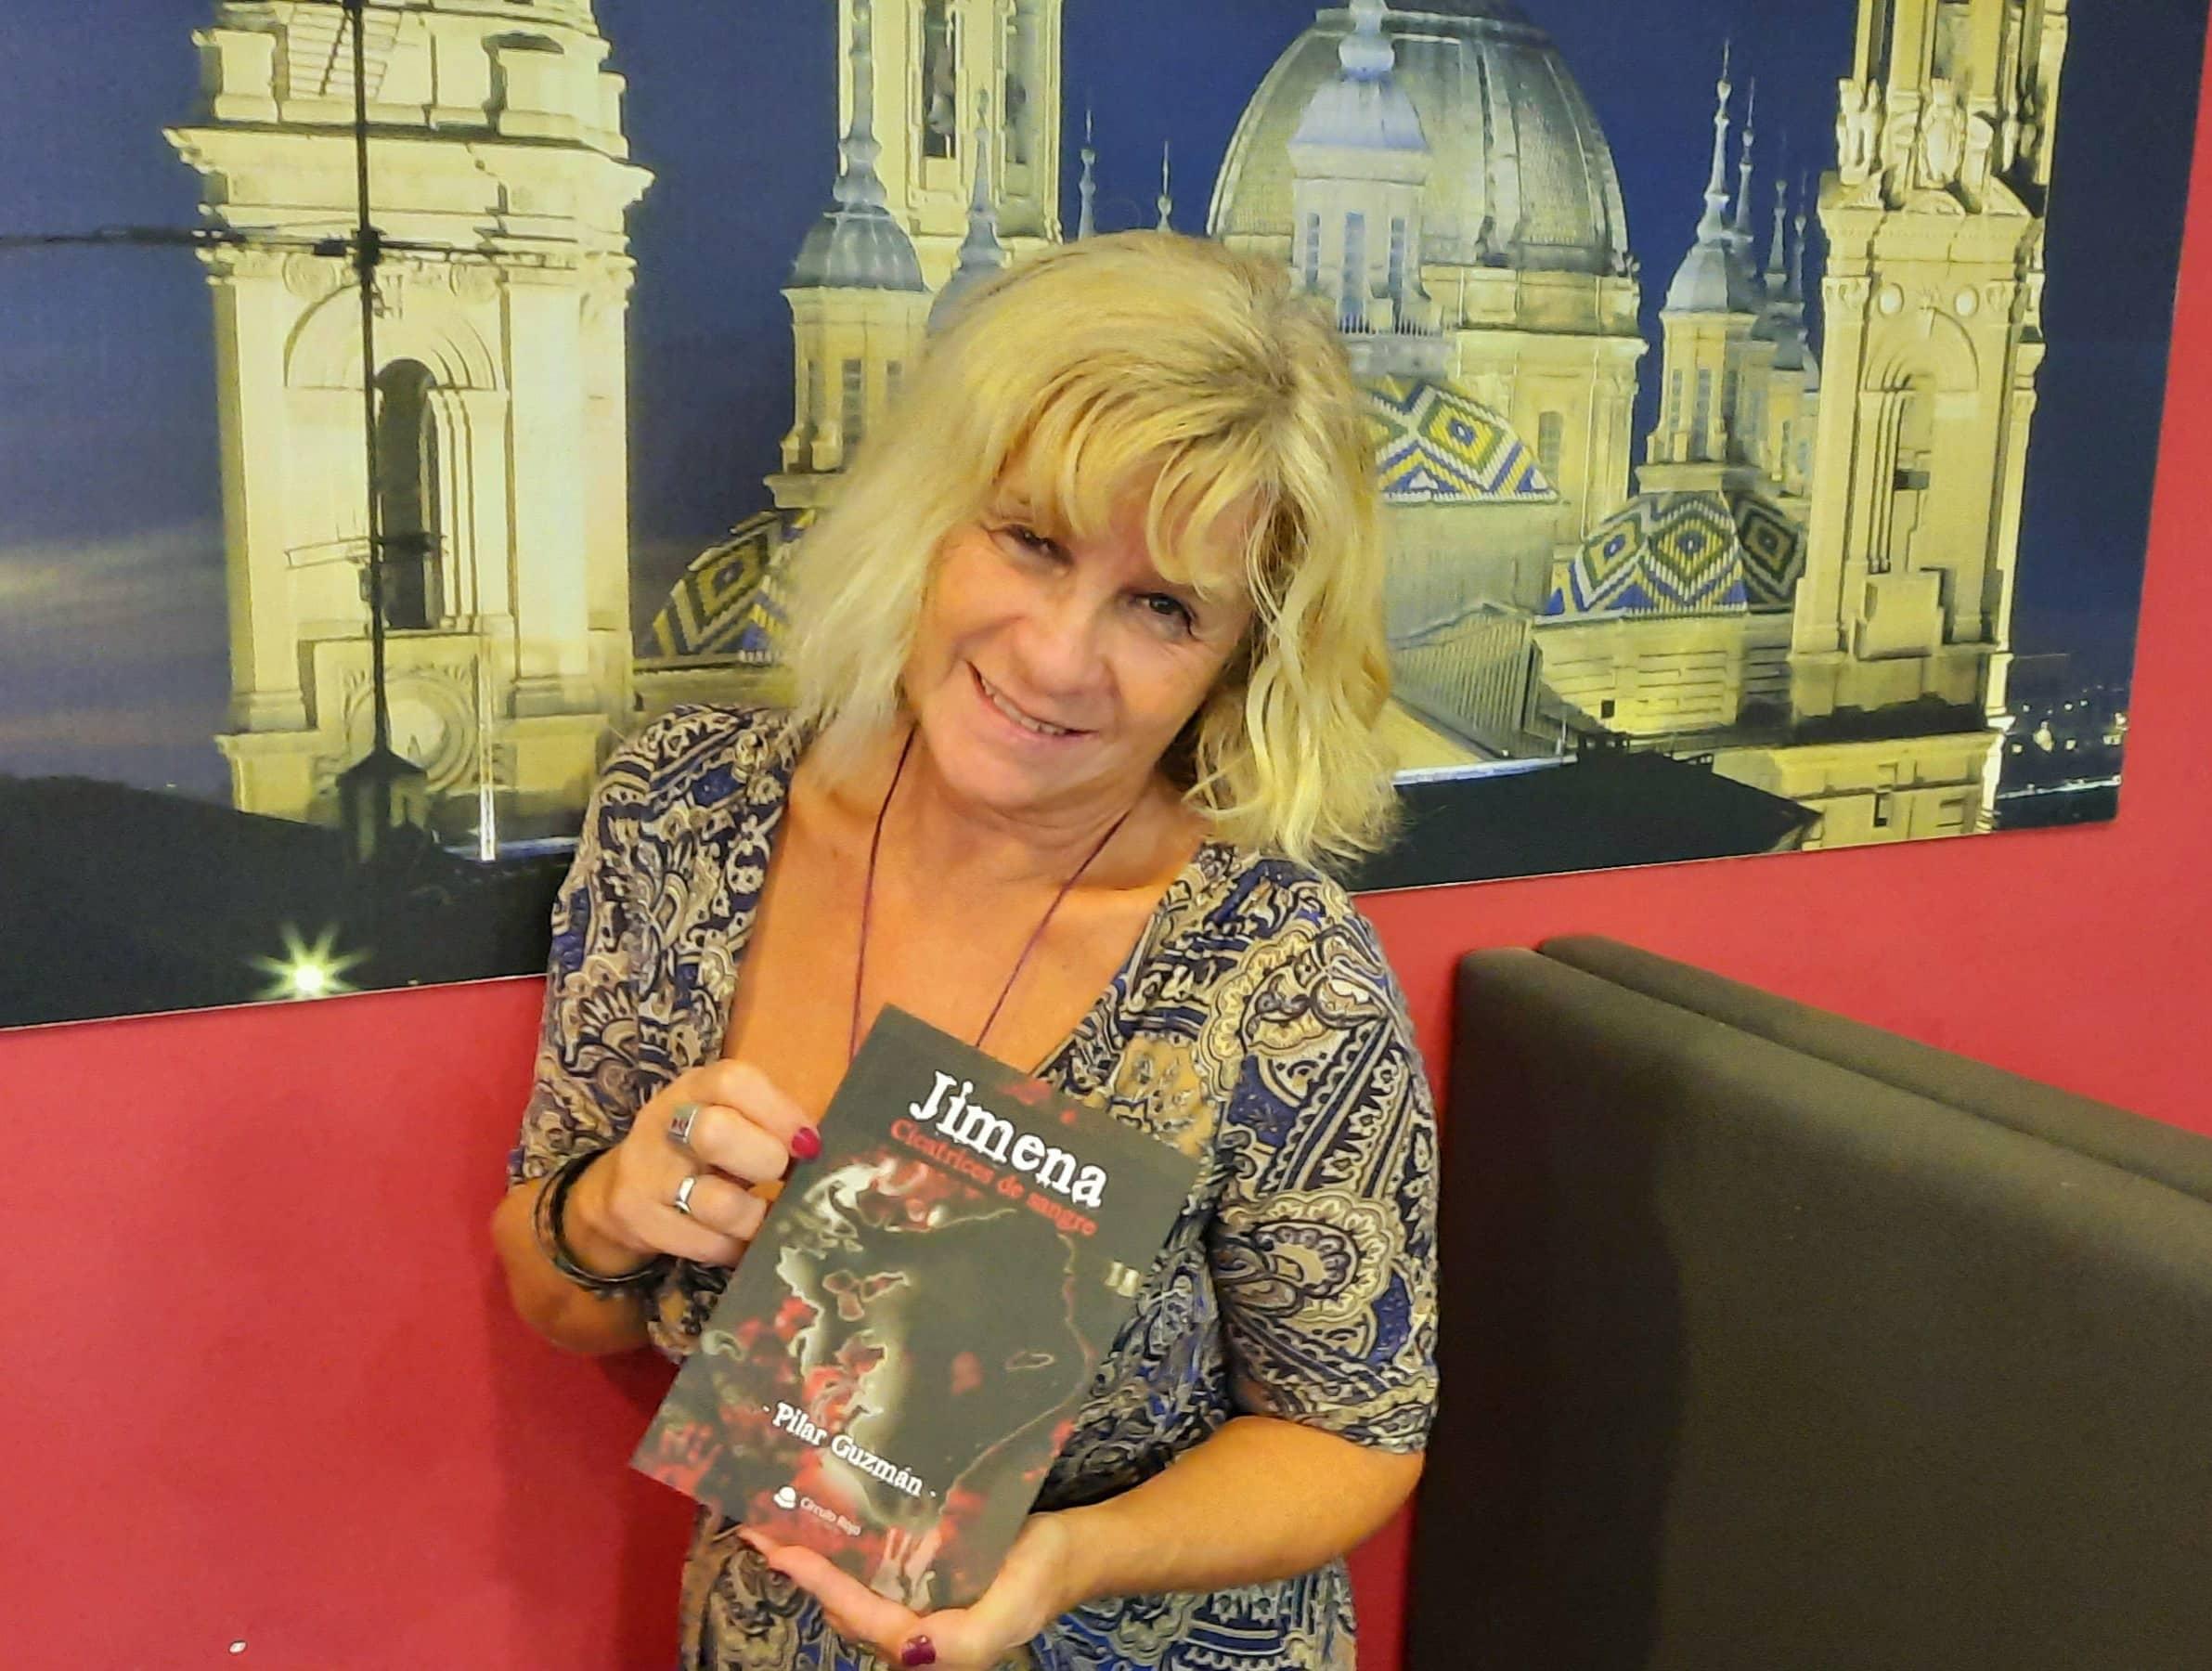 Entrevistamos a la zaragozana Pilar Arkana, autora de, entre otras obras, «Jimena, cicatrices de sangre»